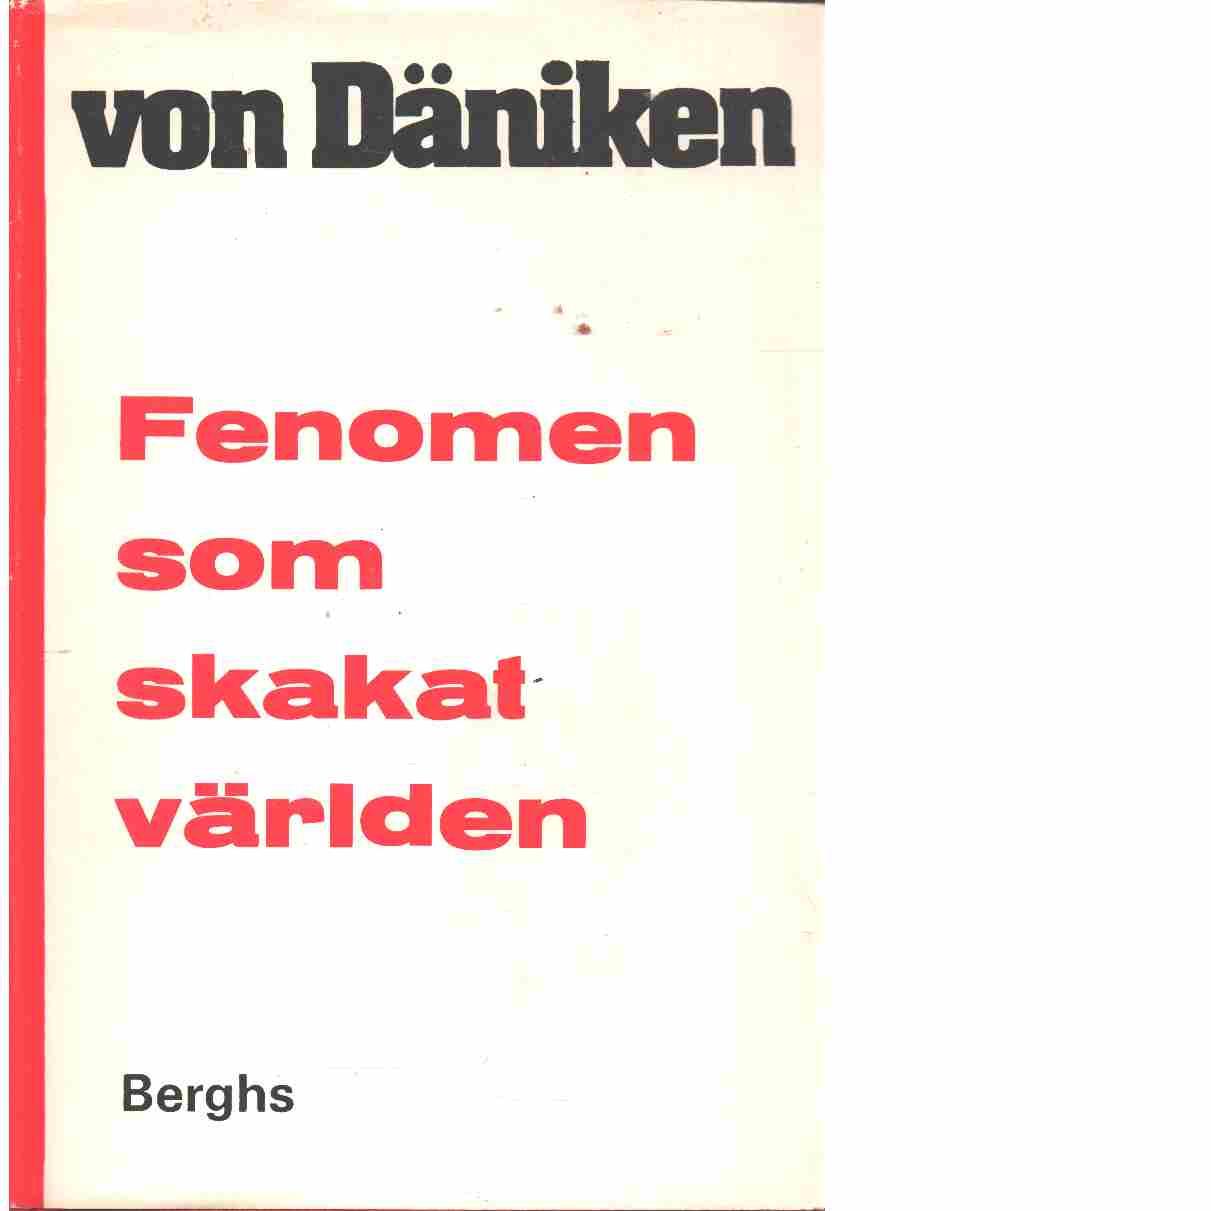 Fenomen som skakat världen - Däniken, Erich von